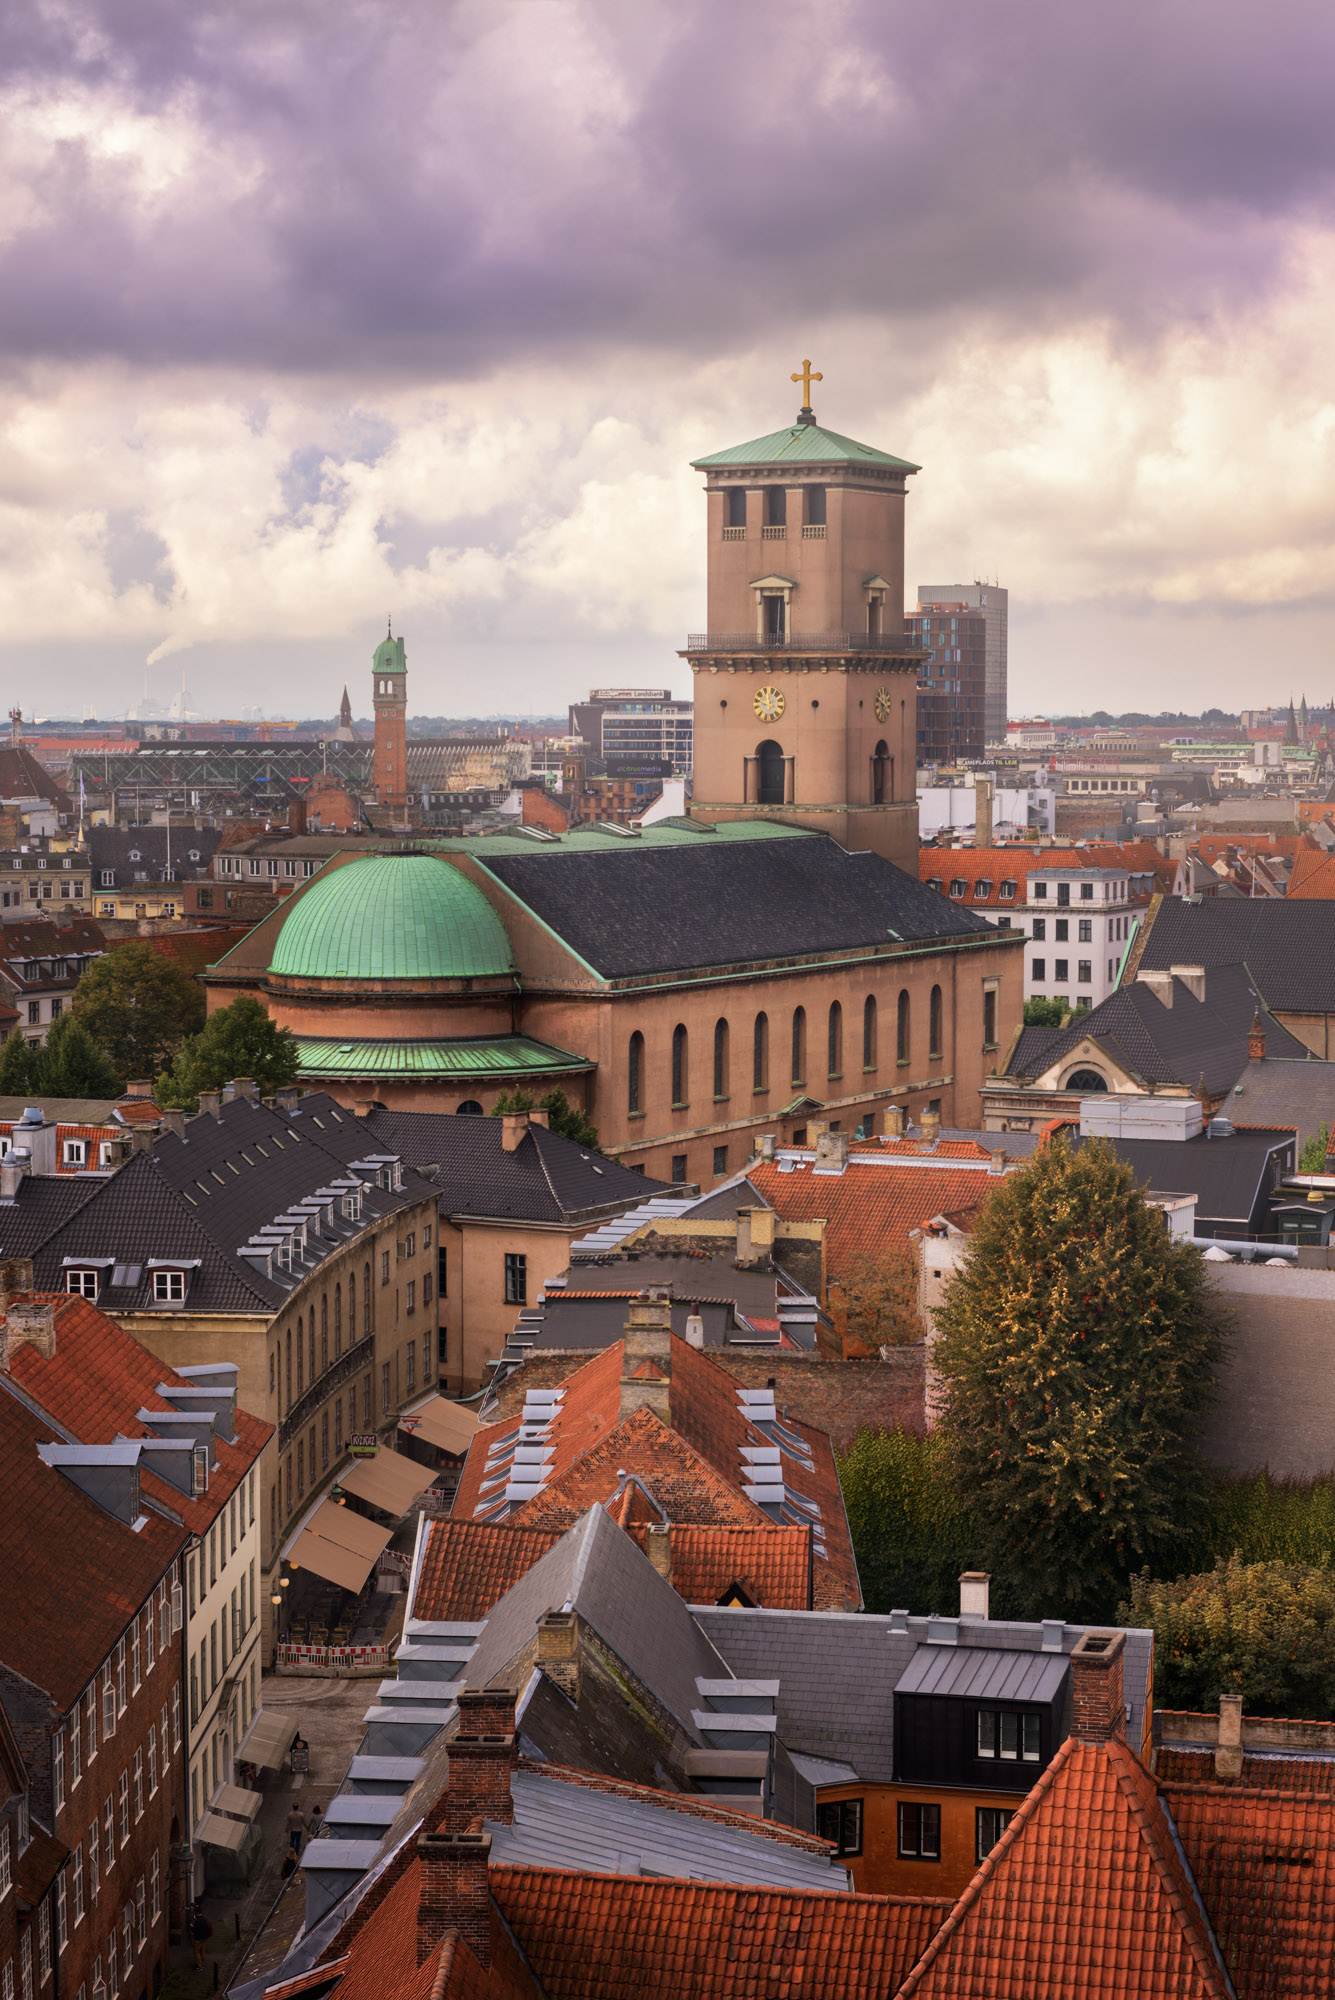 Church of Our Lady and Copenhagen Skyline, Denmark